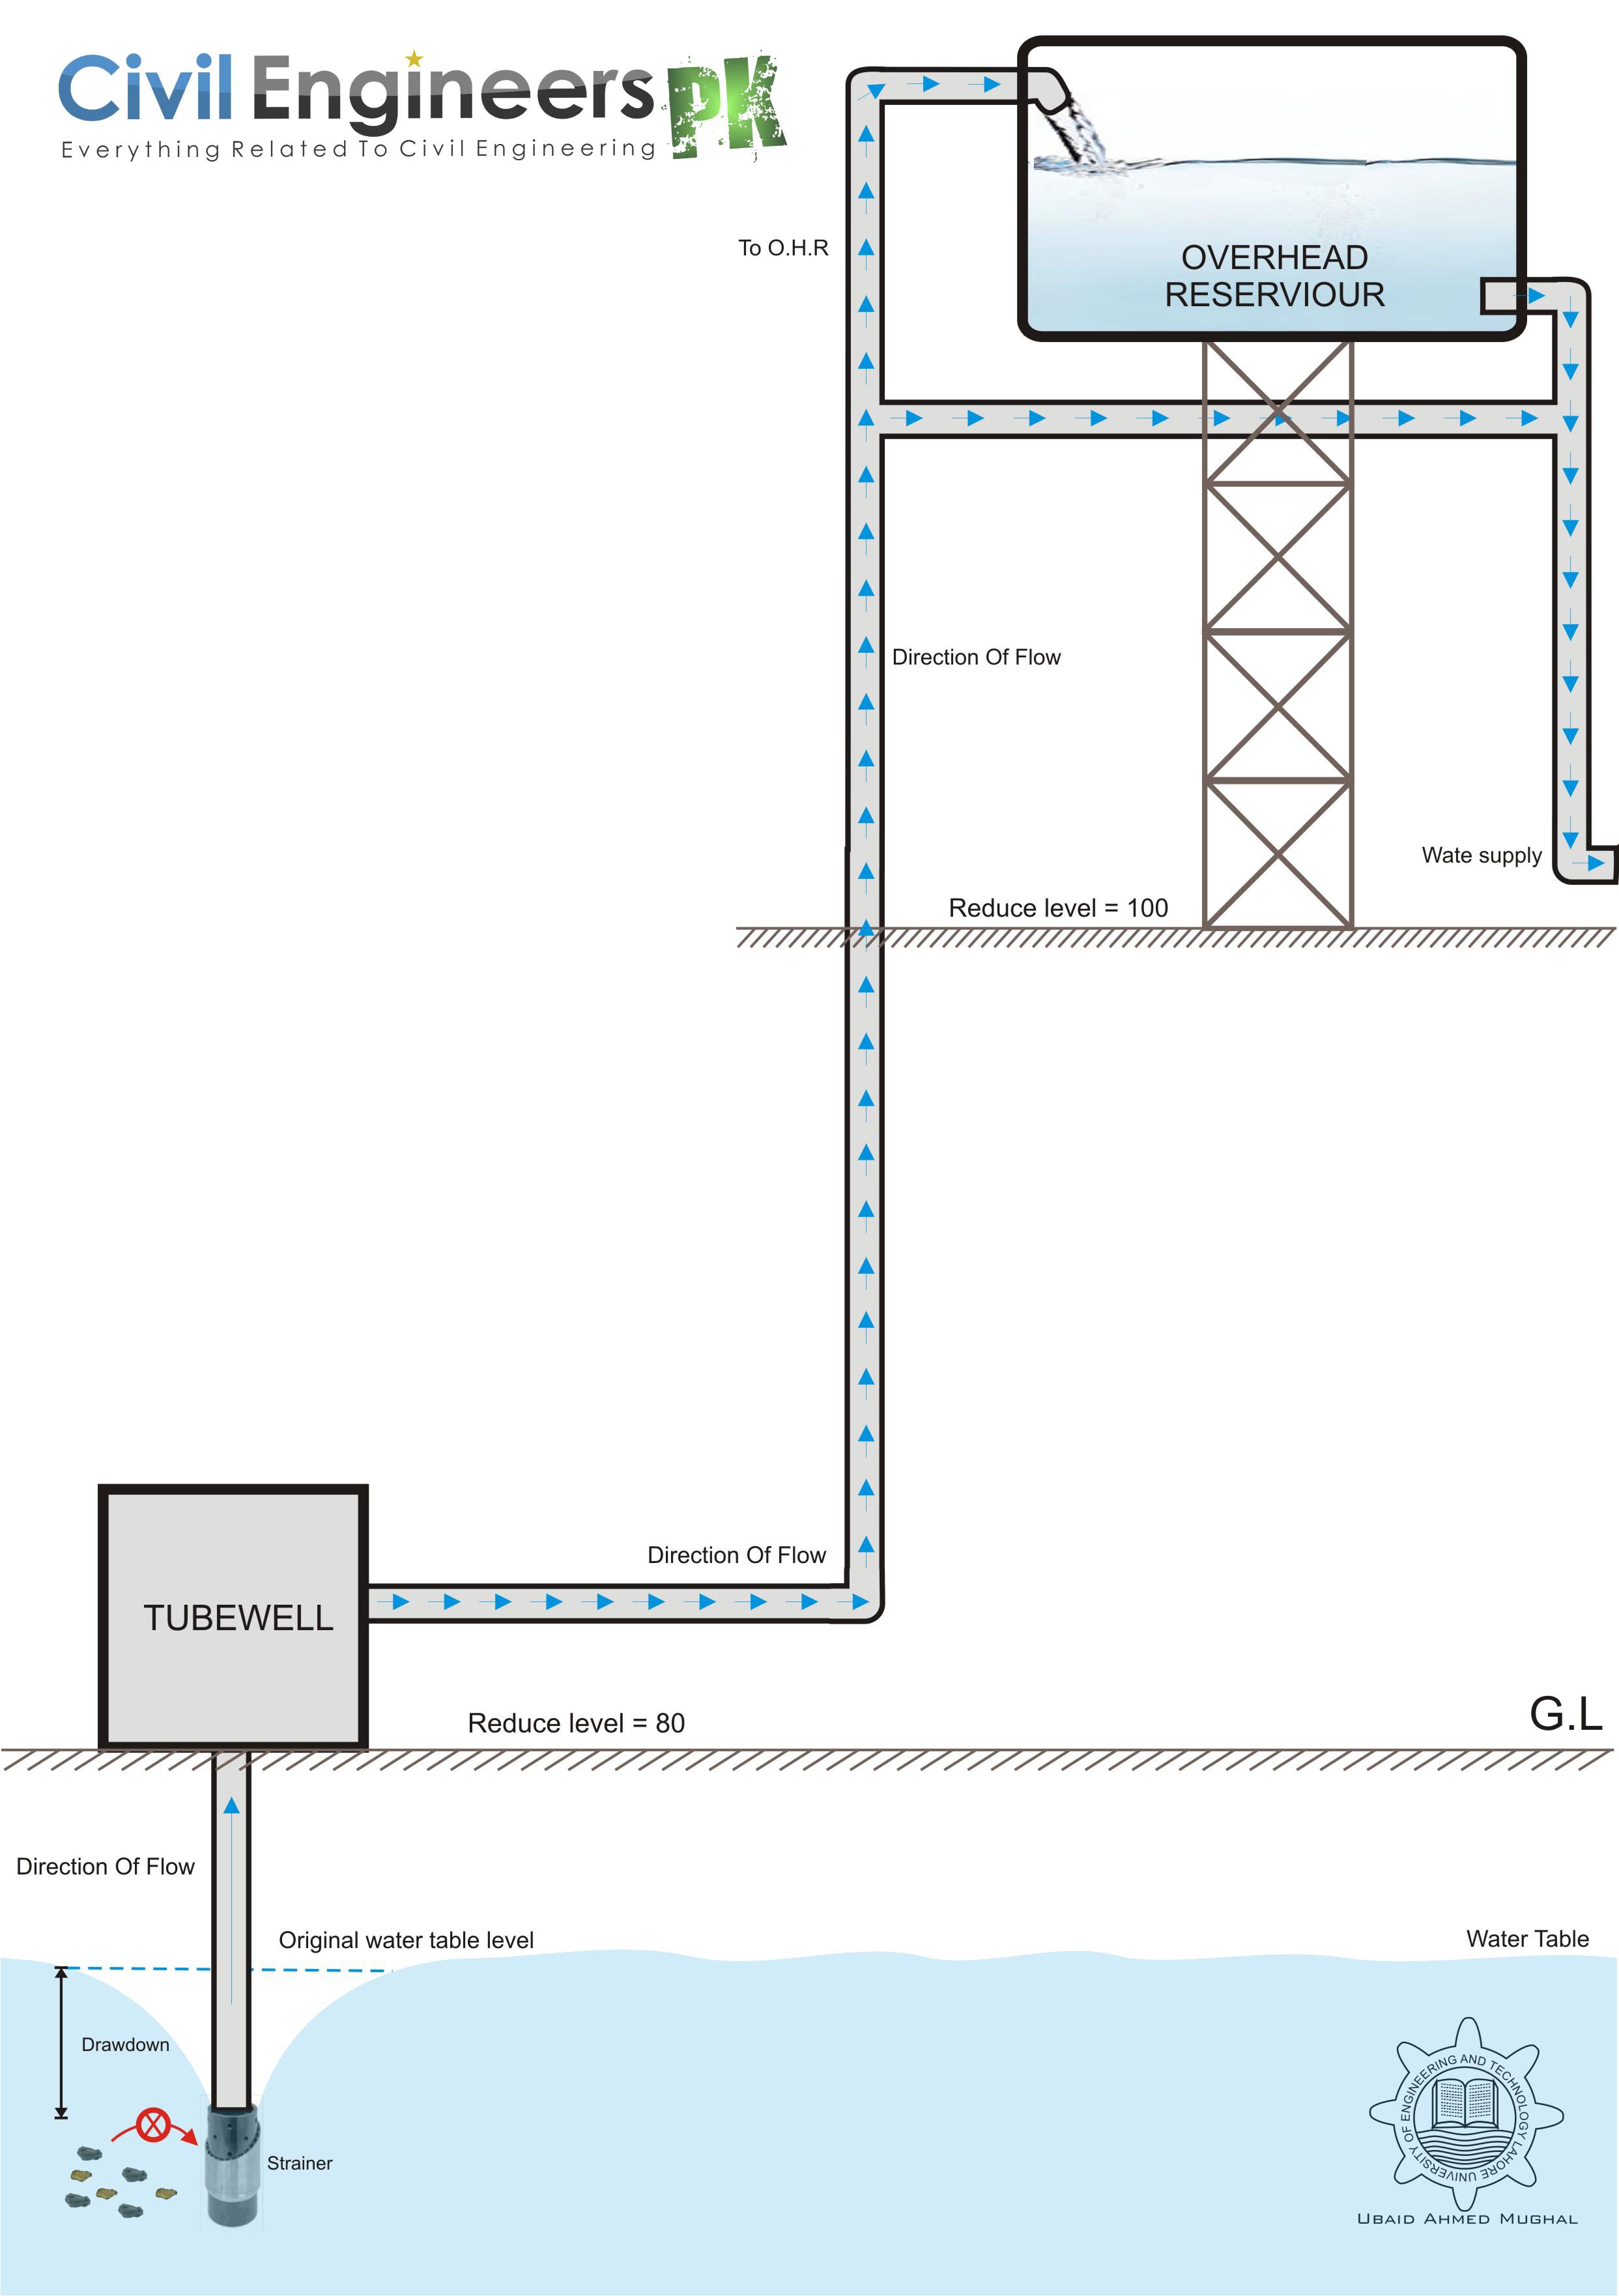 Water Supply Design - Civil Engineers PK